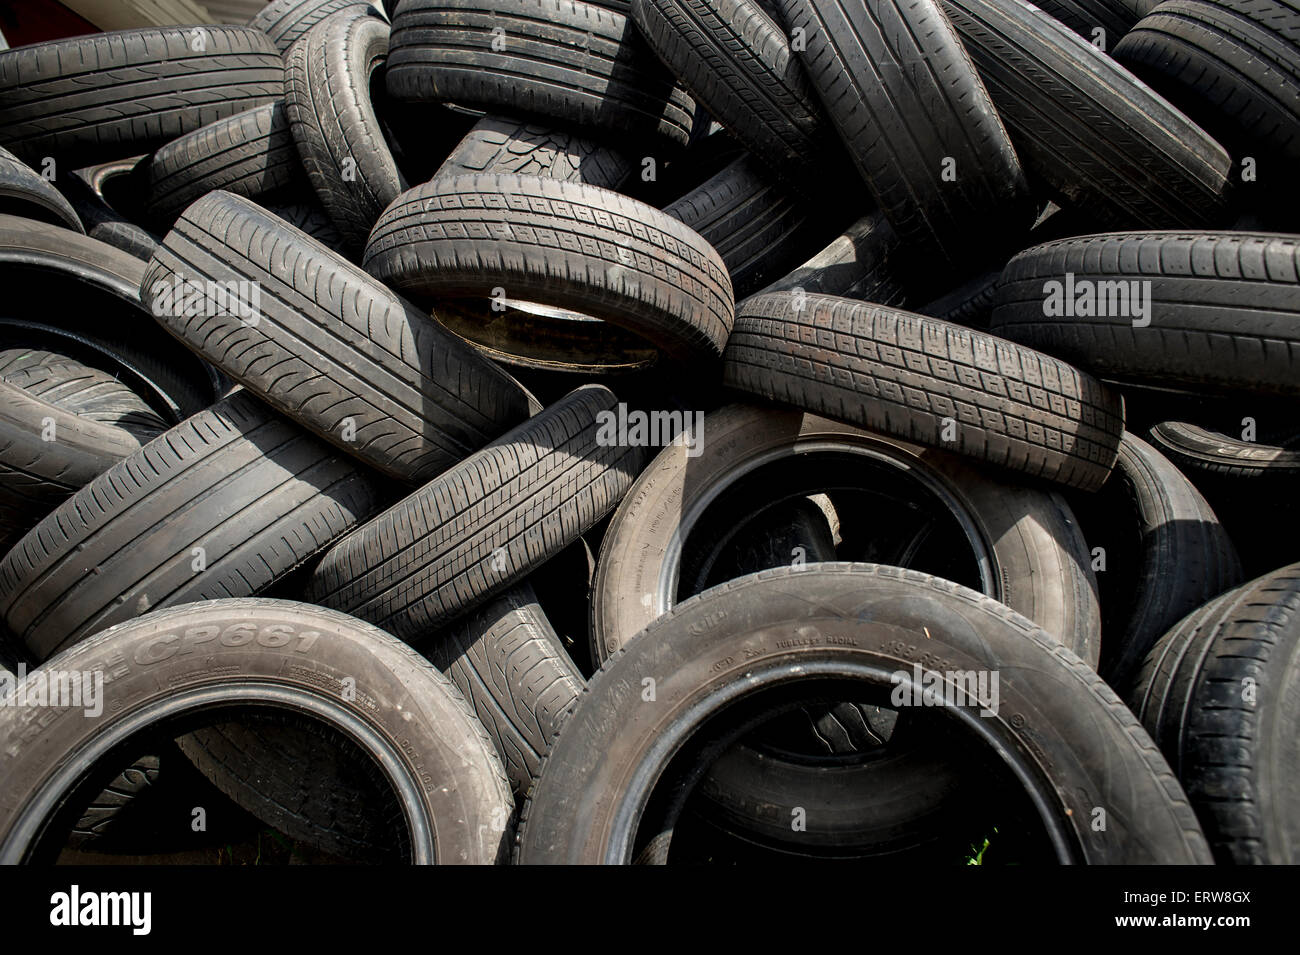 worn car tyres - Stock Image